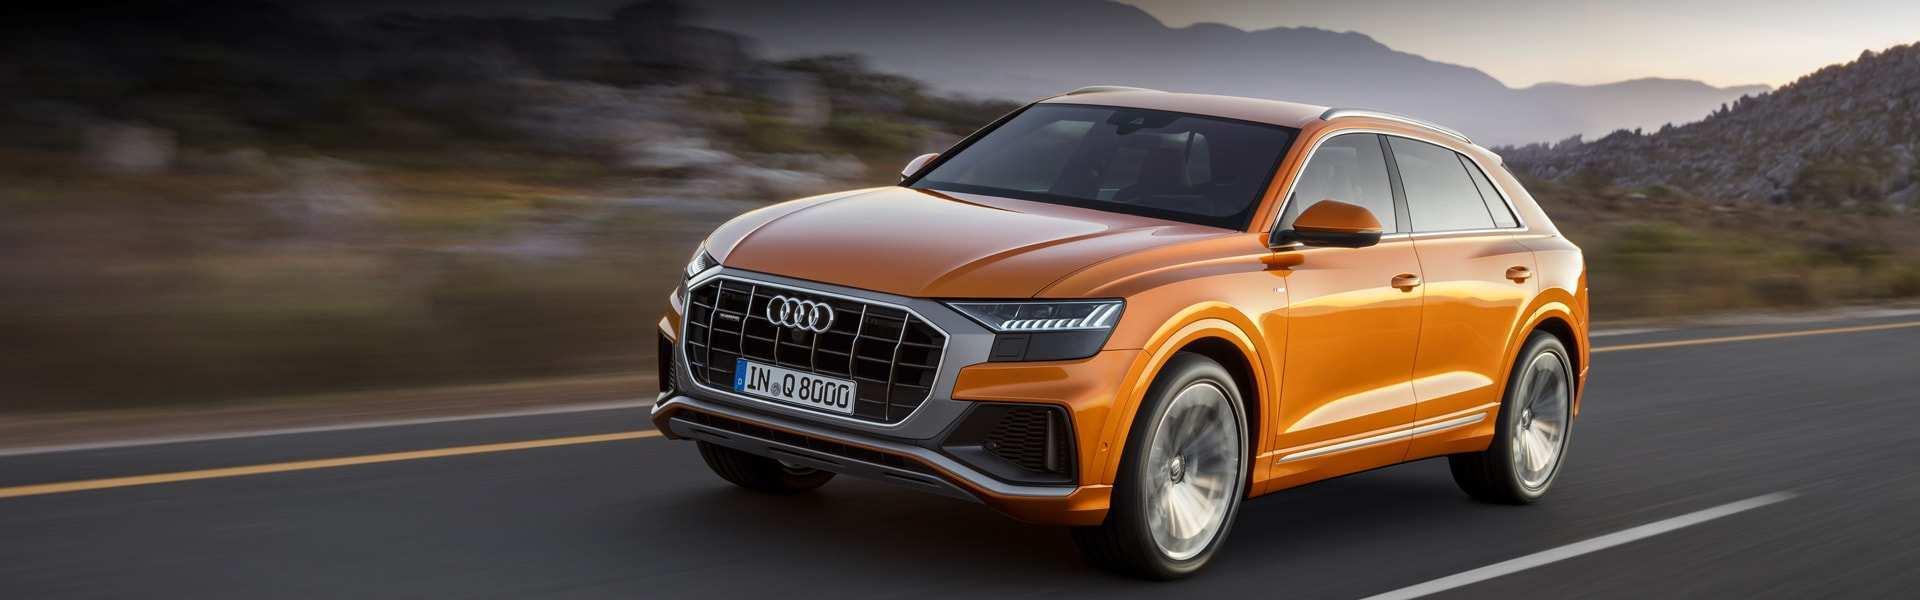 83 Best Review Audi 2019 Q8 Price Interior Performance and New Engine with Audi 2019 Q8 Price Interior